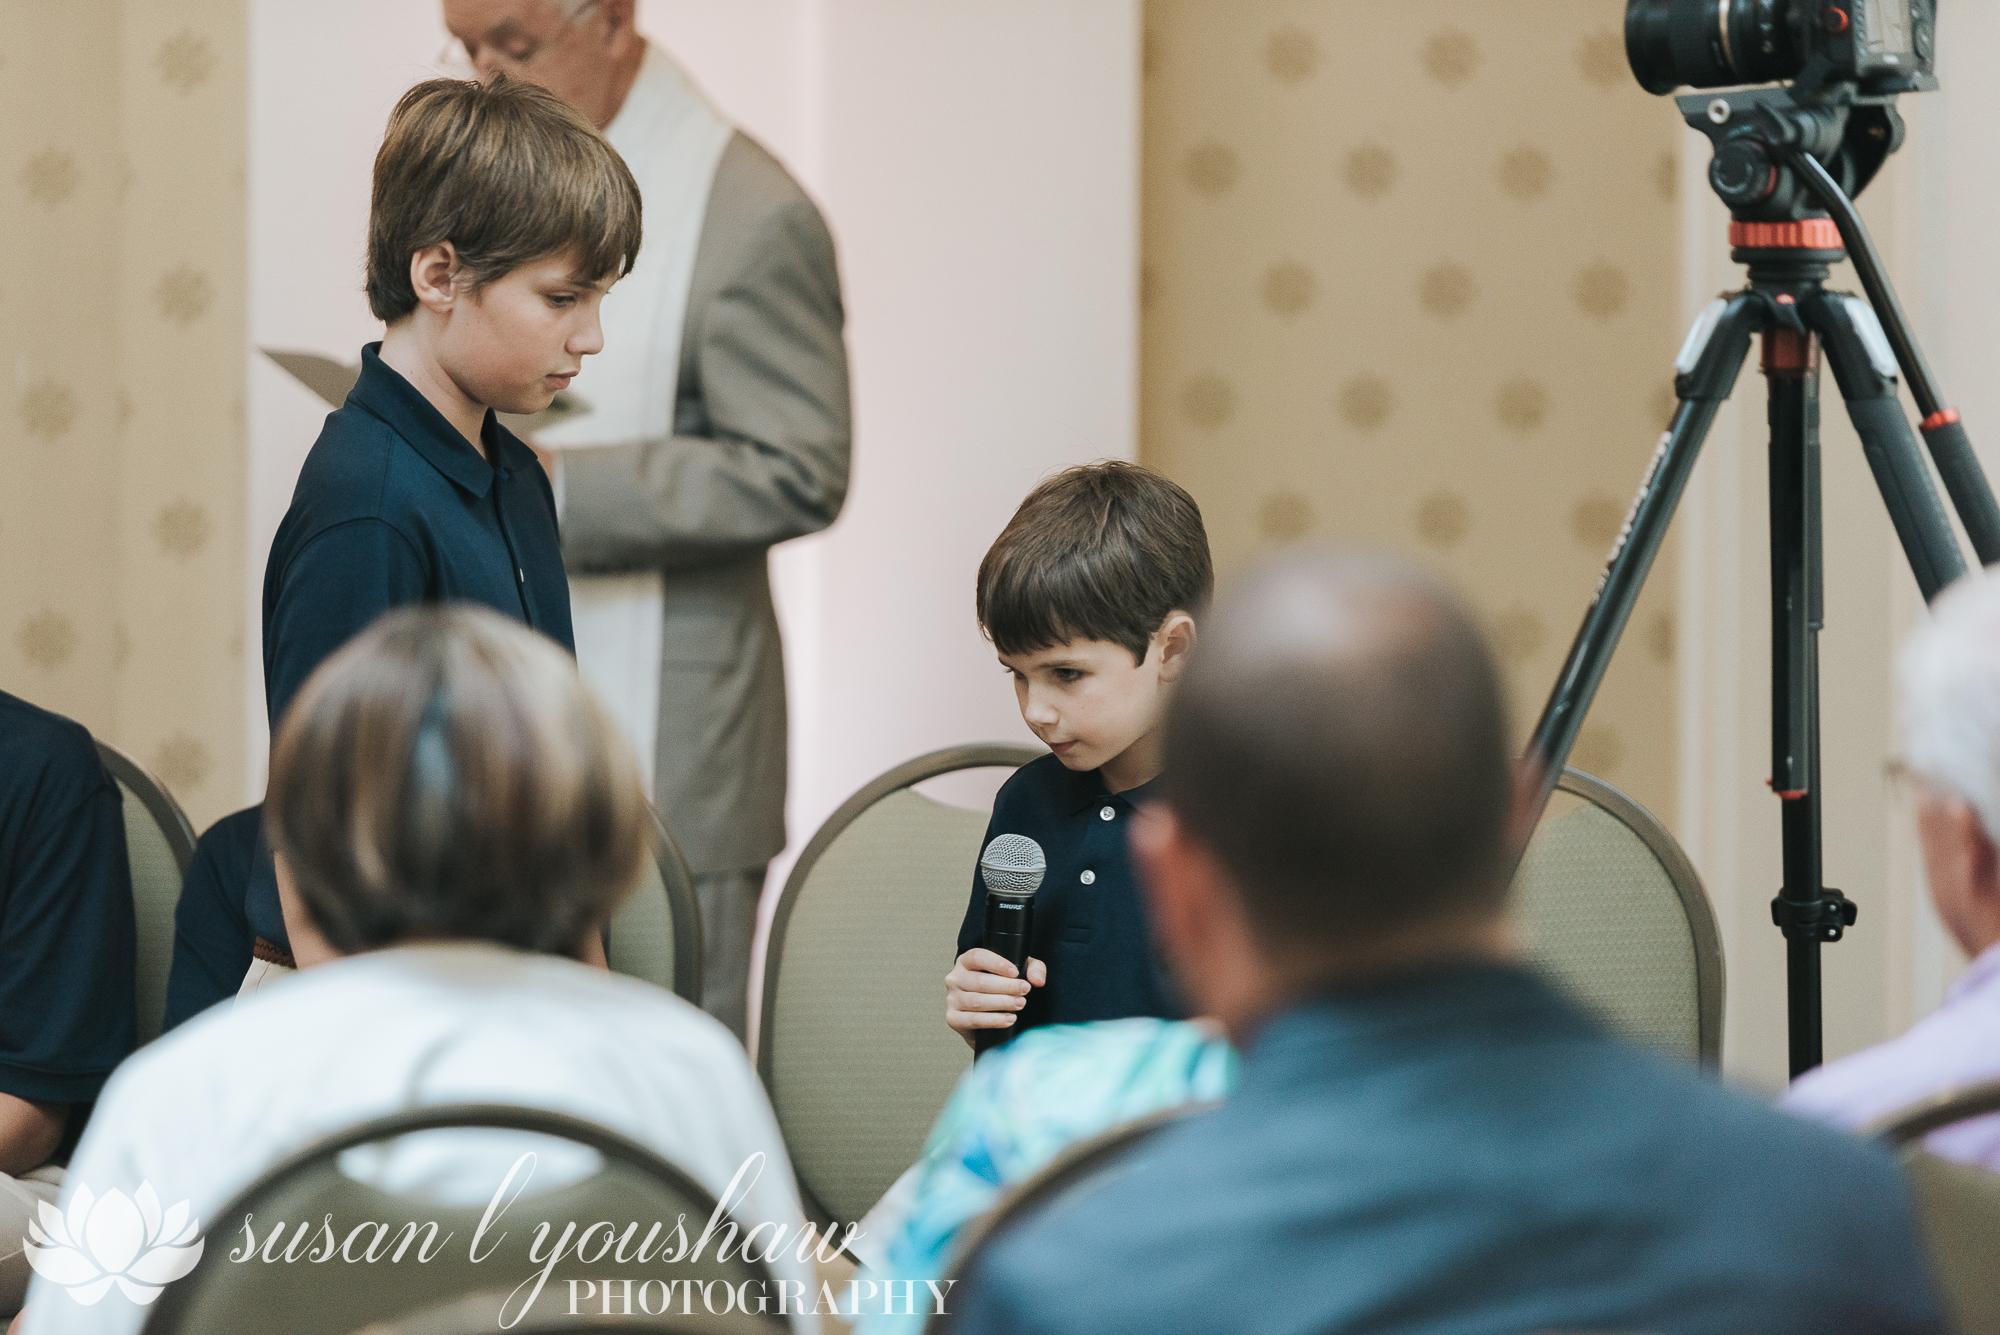 BLOG Carolyn Adams and Jim McCune 07-04-2018 SLY Photography-90.jpg